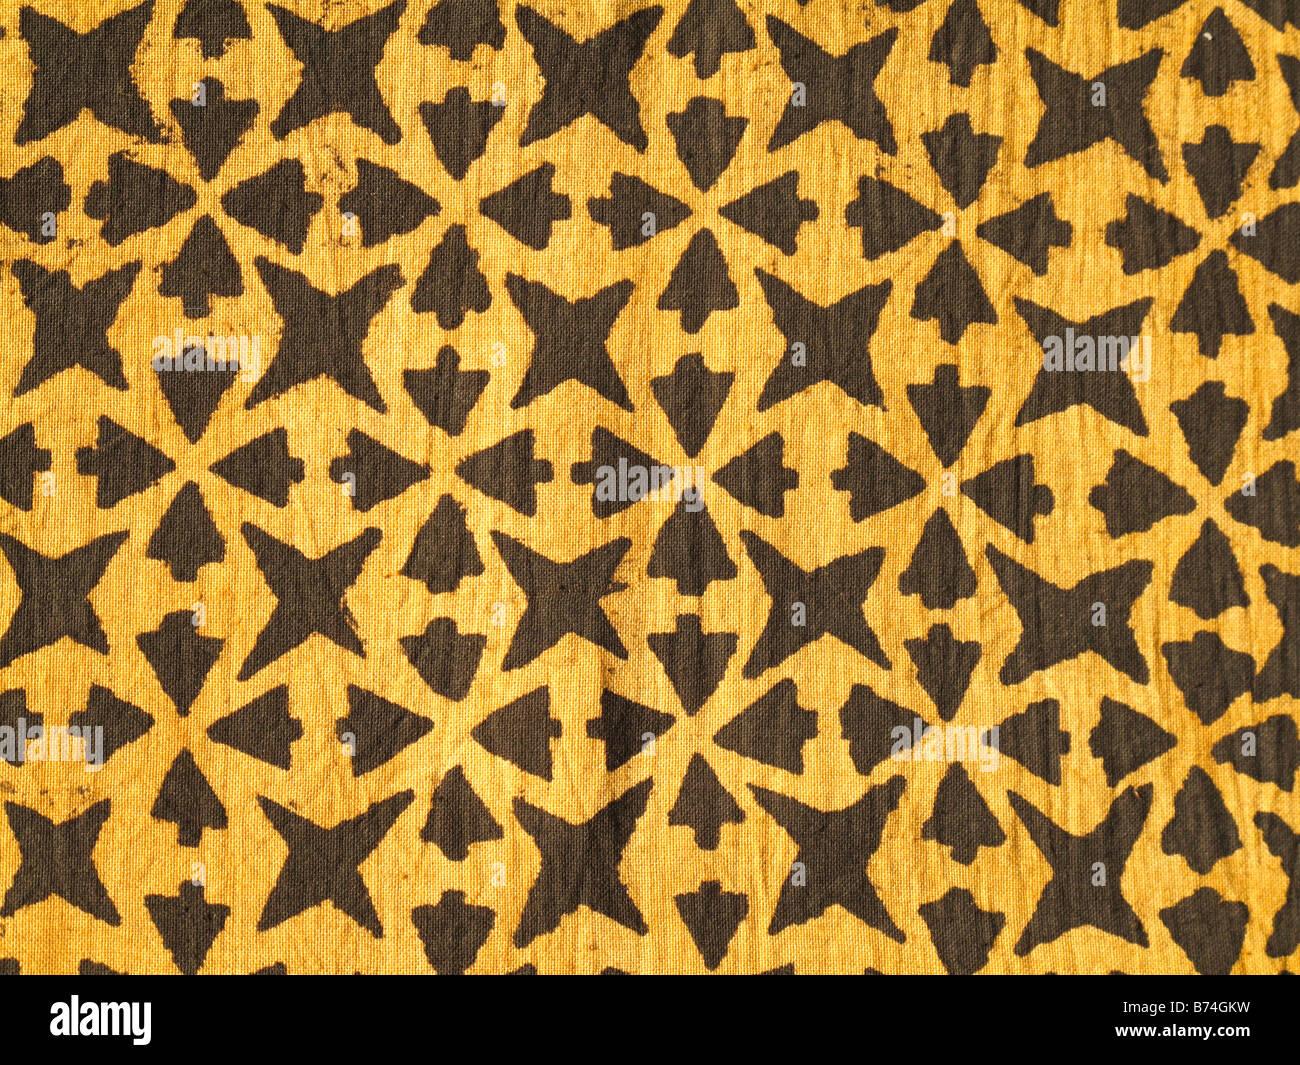 Handspun fabric from Mali Stock Photo